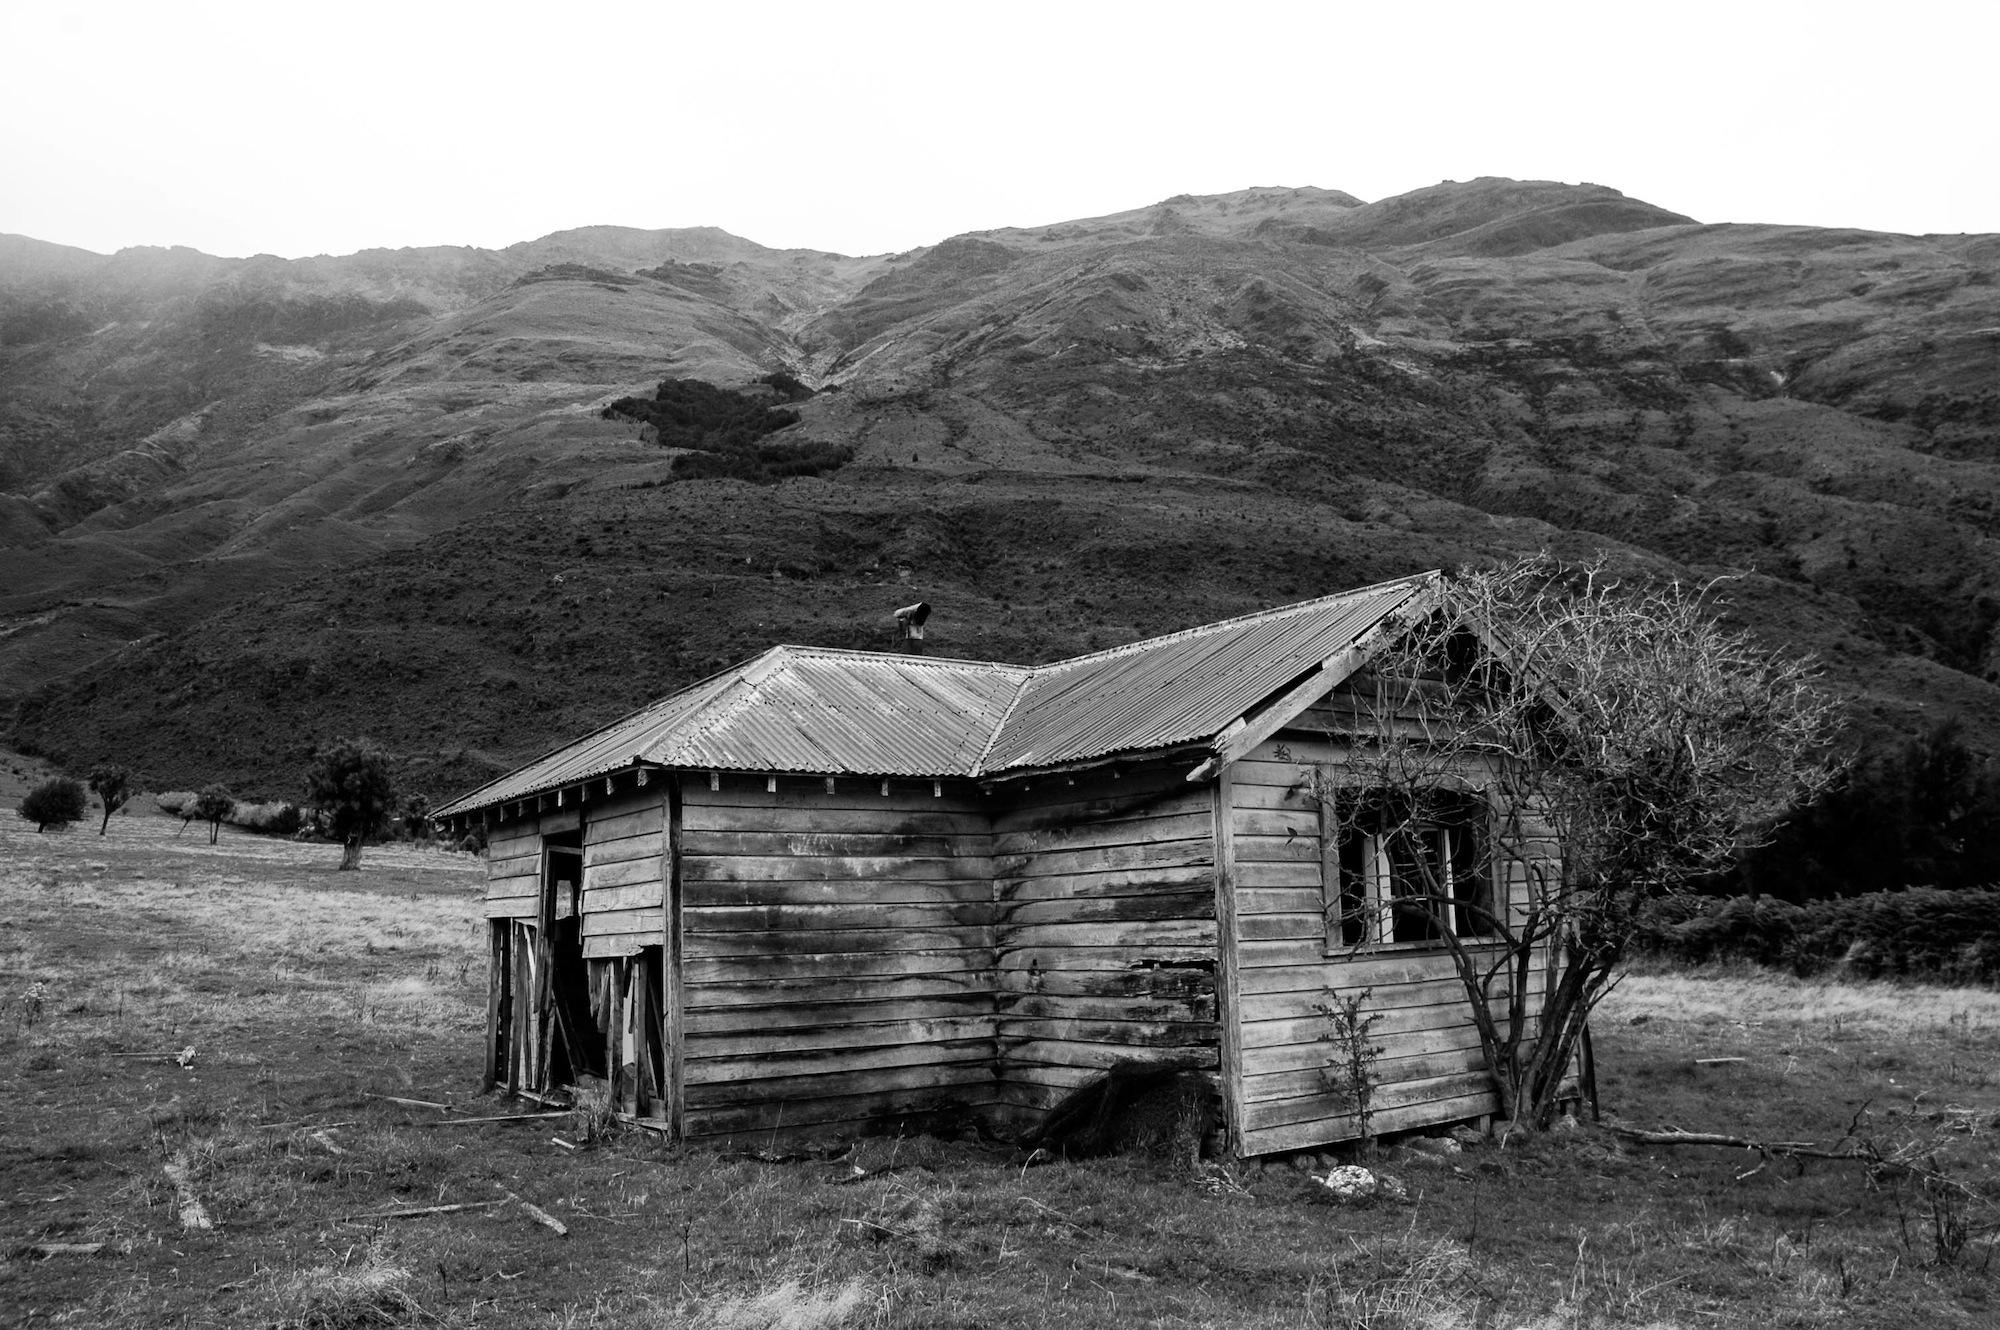 abandoned_house_new zealand_ben_howe_11.jpg